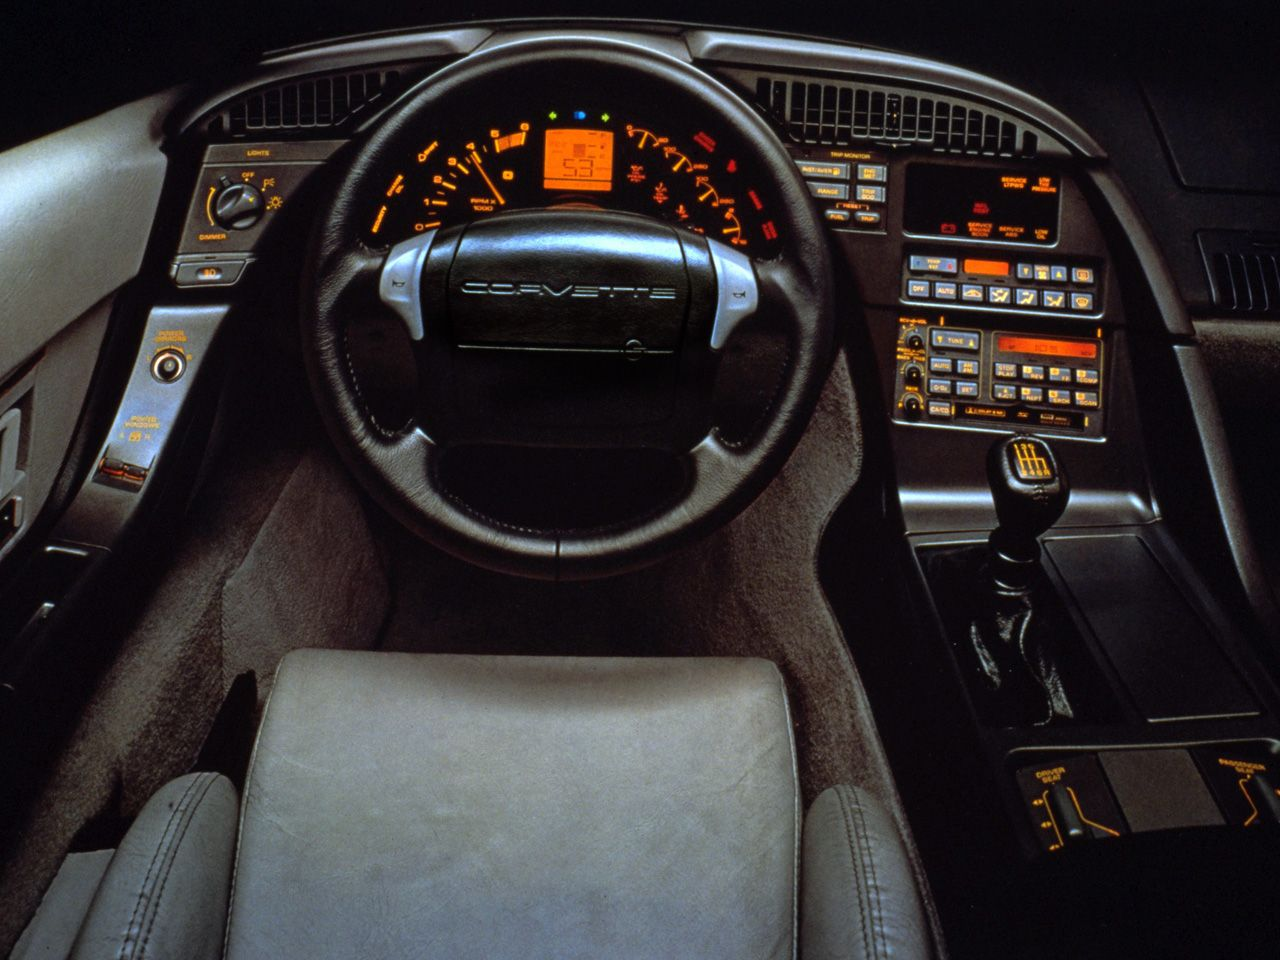 small resolution of 1995 corvette interior chevrolet corvette c4 manual transmission super sport buick cadillac